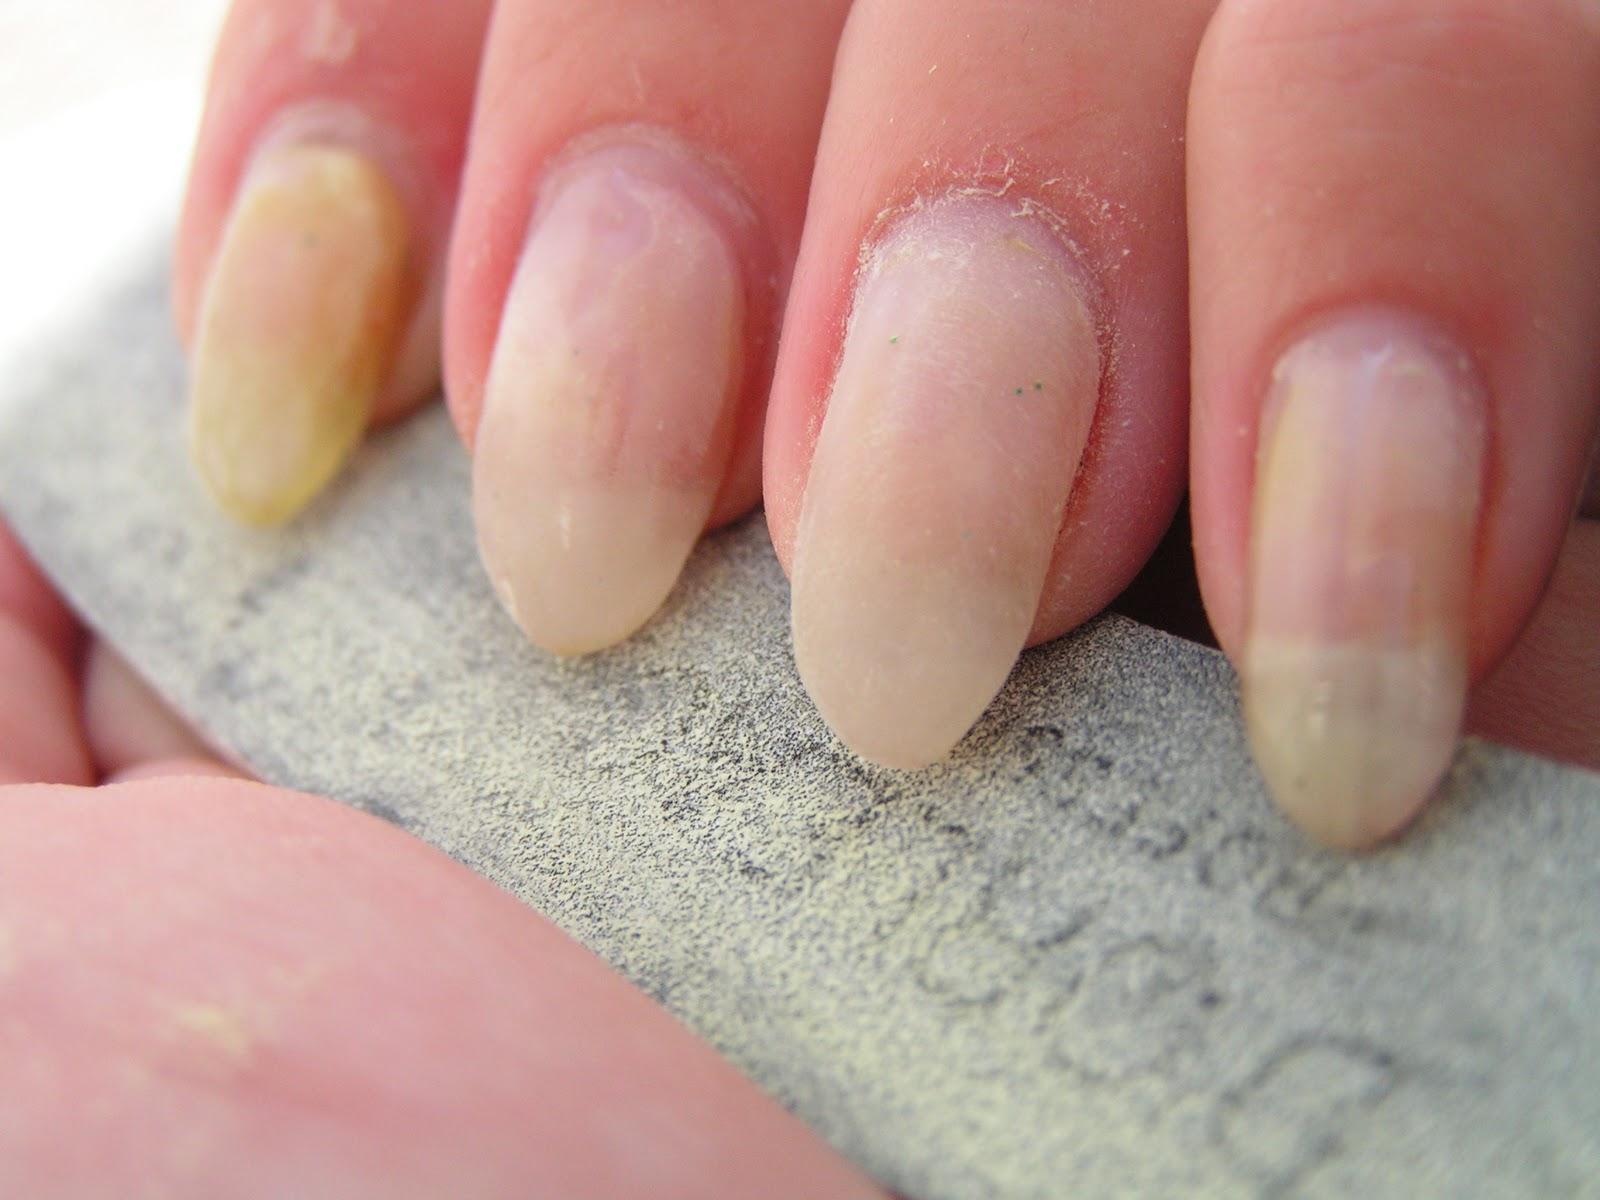 Nicki Minaj Pointy Nail Designs Cure affected nails again.